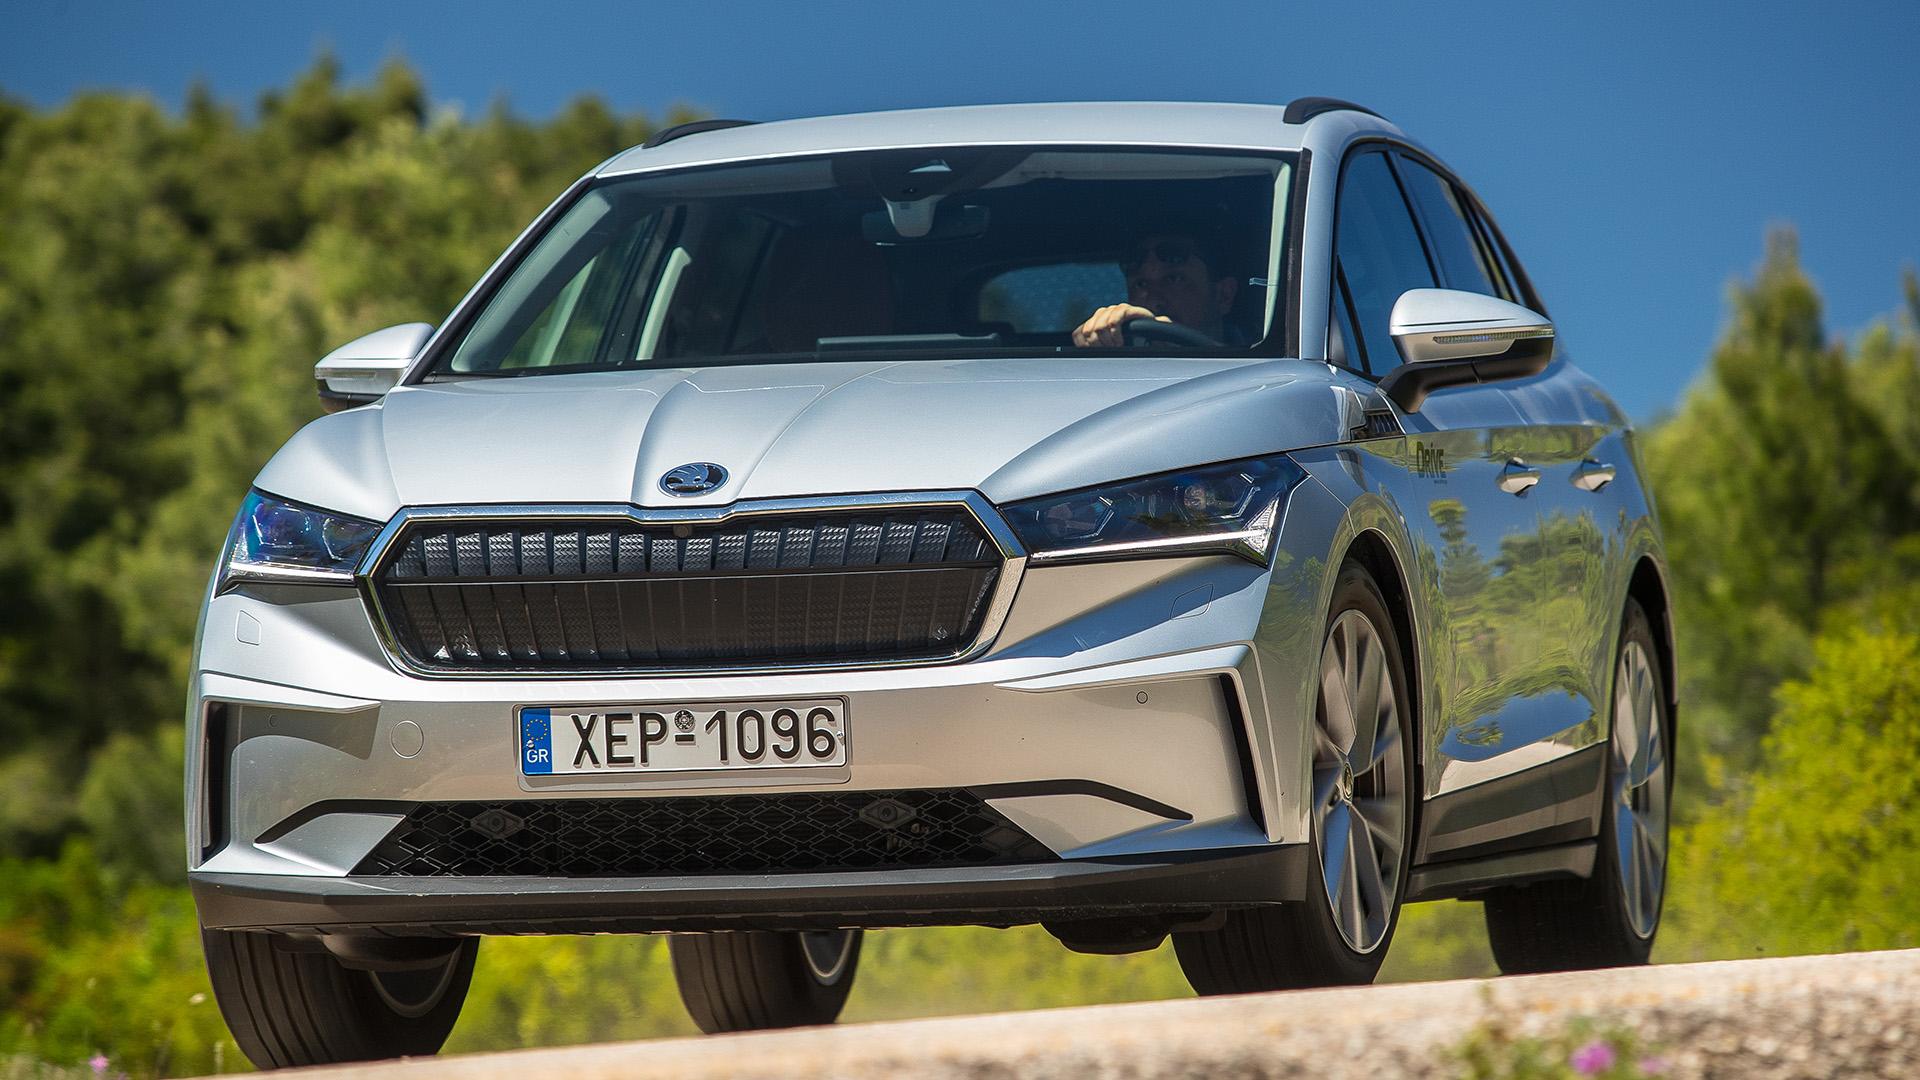 Skoda Enyaq iV: Δοκιμάζουμε το πρώτο ηλεκτρικό SUV της φίρμας (pics)